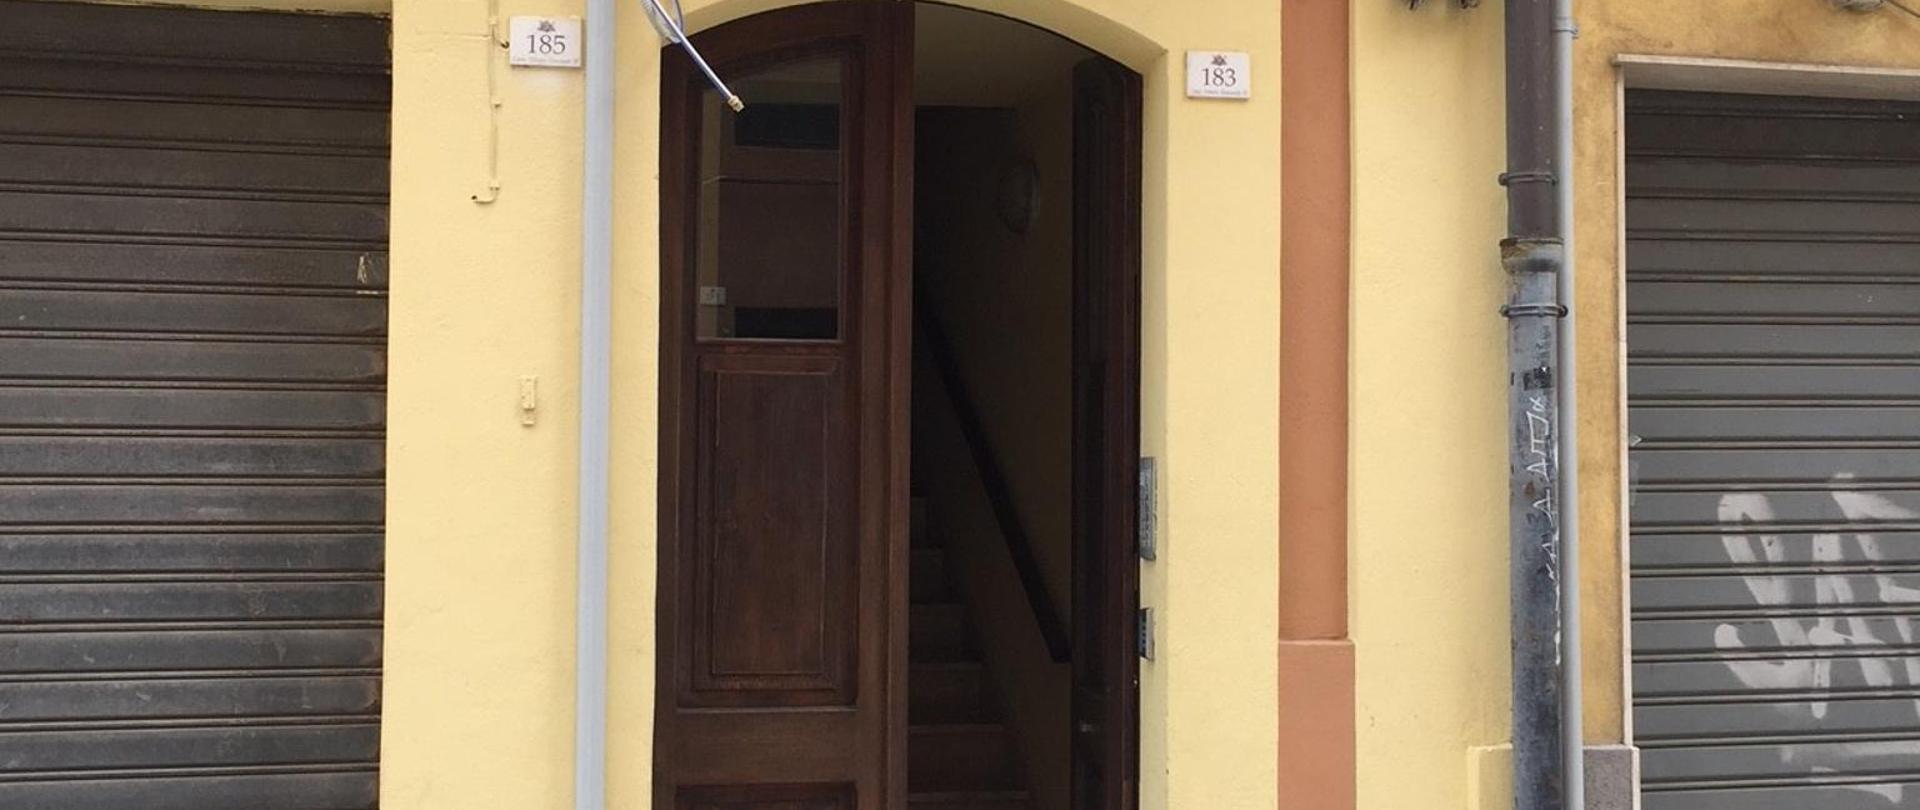 Porta ingresso.jpg